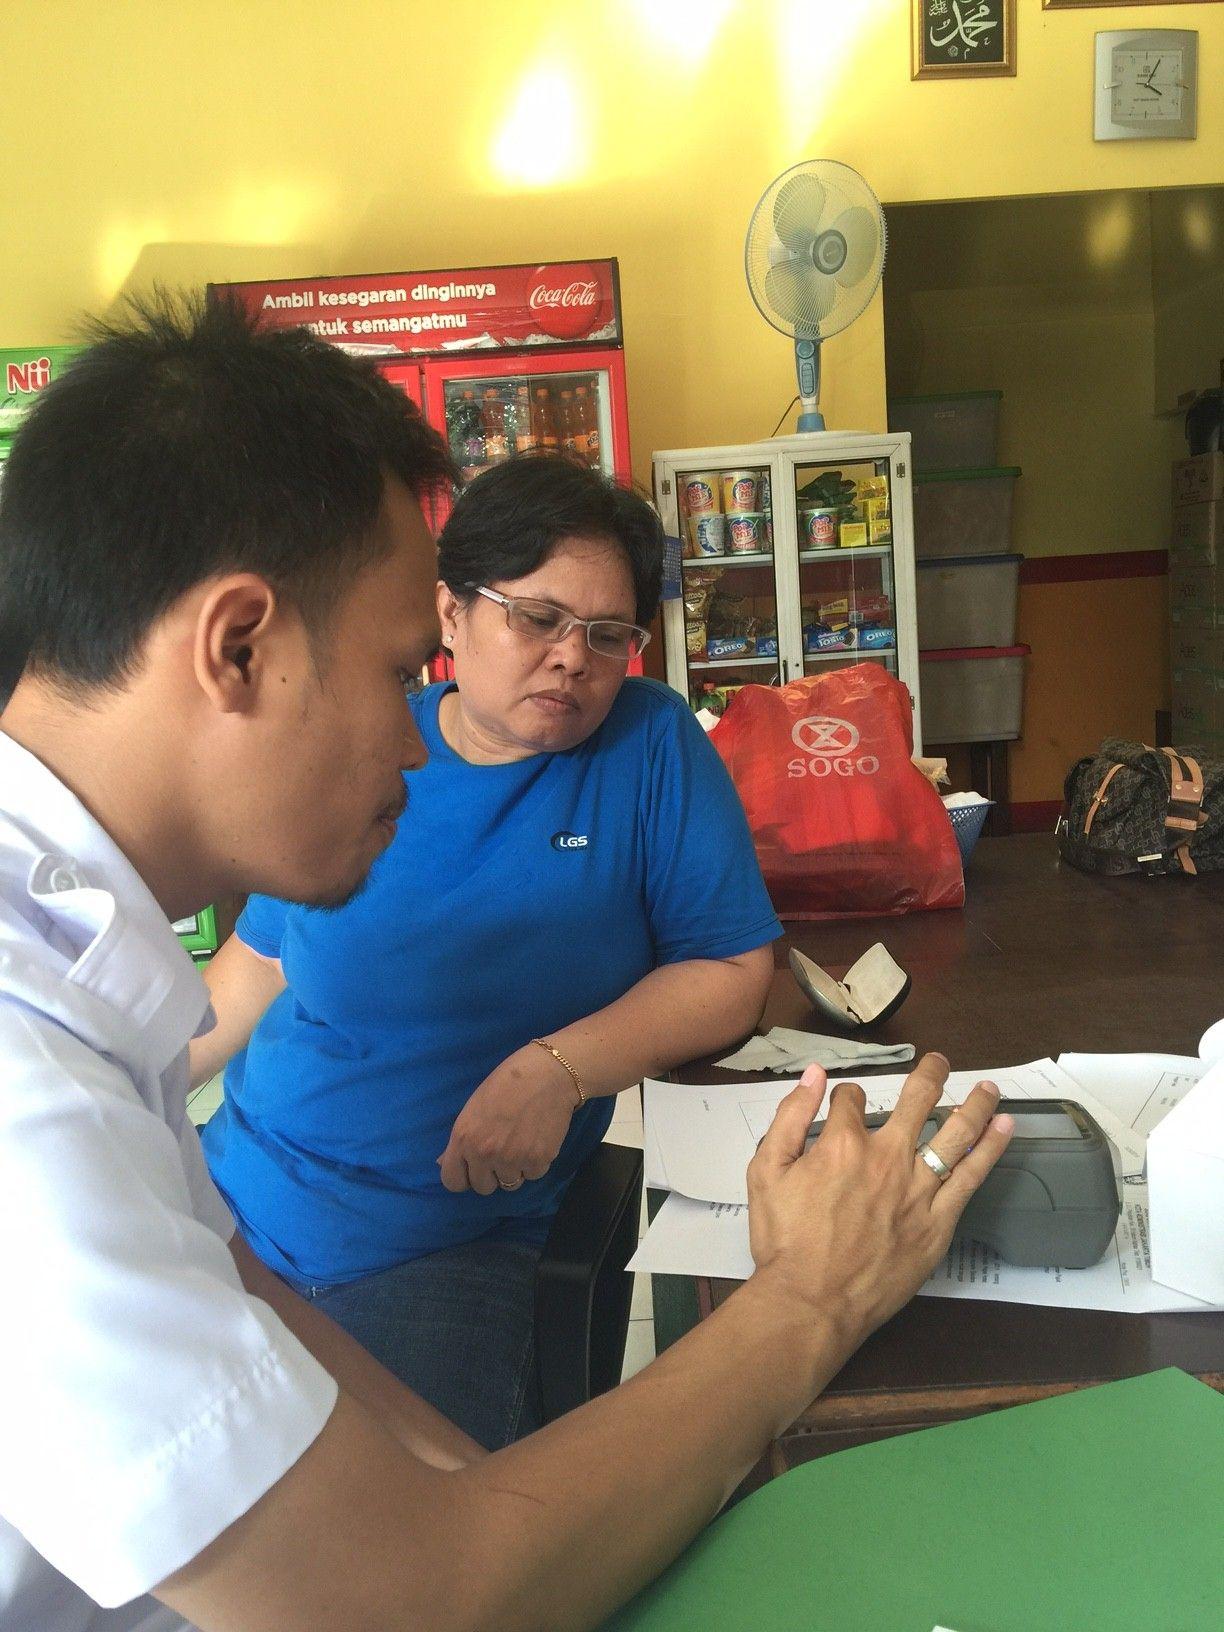 Staf UPPD Duren Sawit menyerahkan alat E-POS dan Bimtek kepada WP Warung Jawa